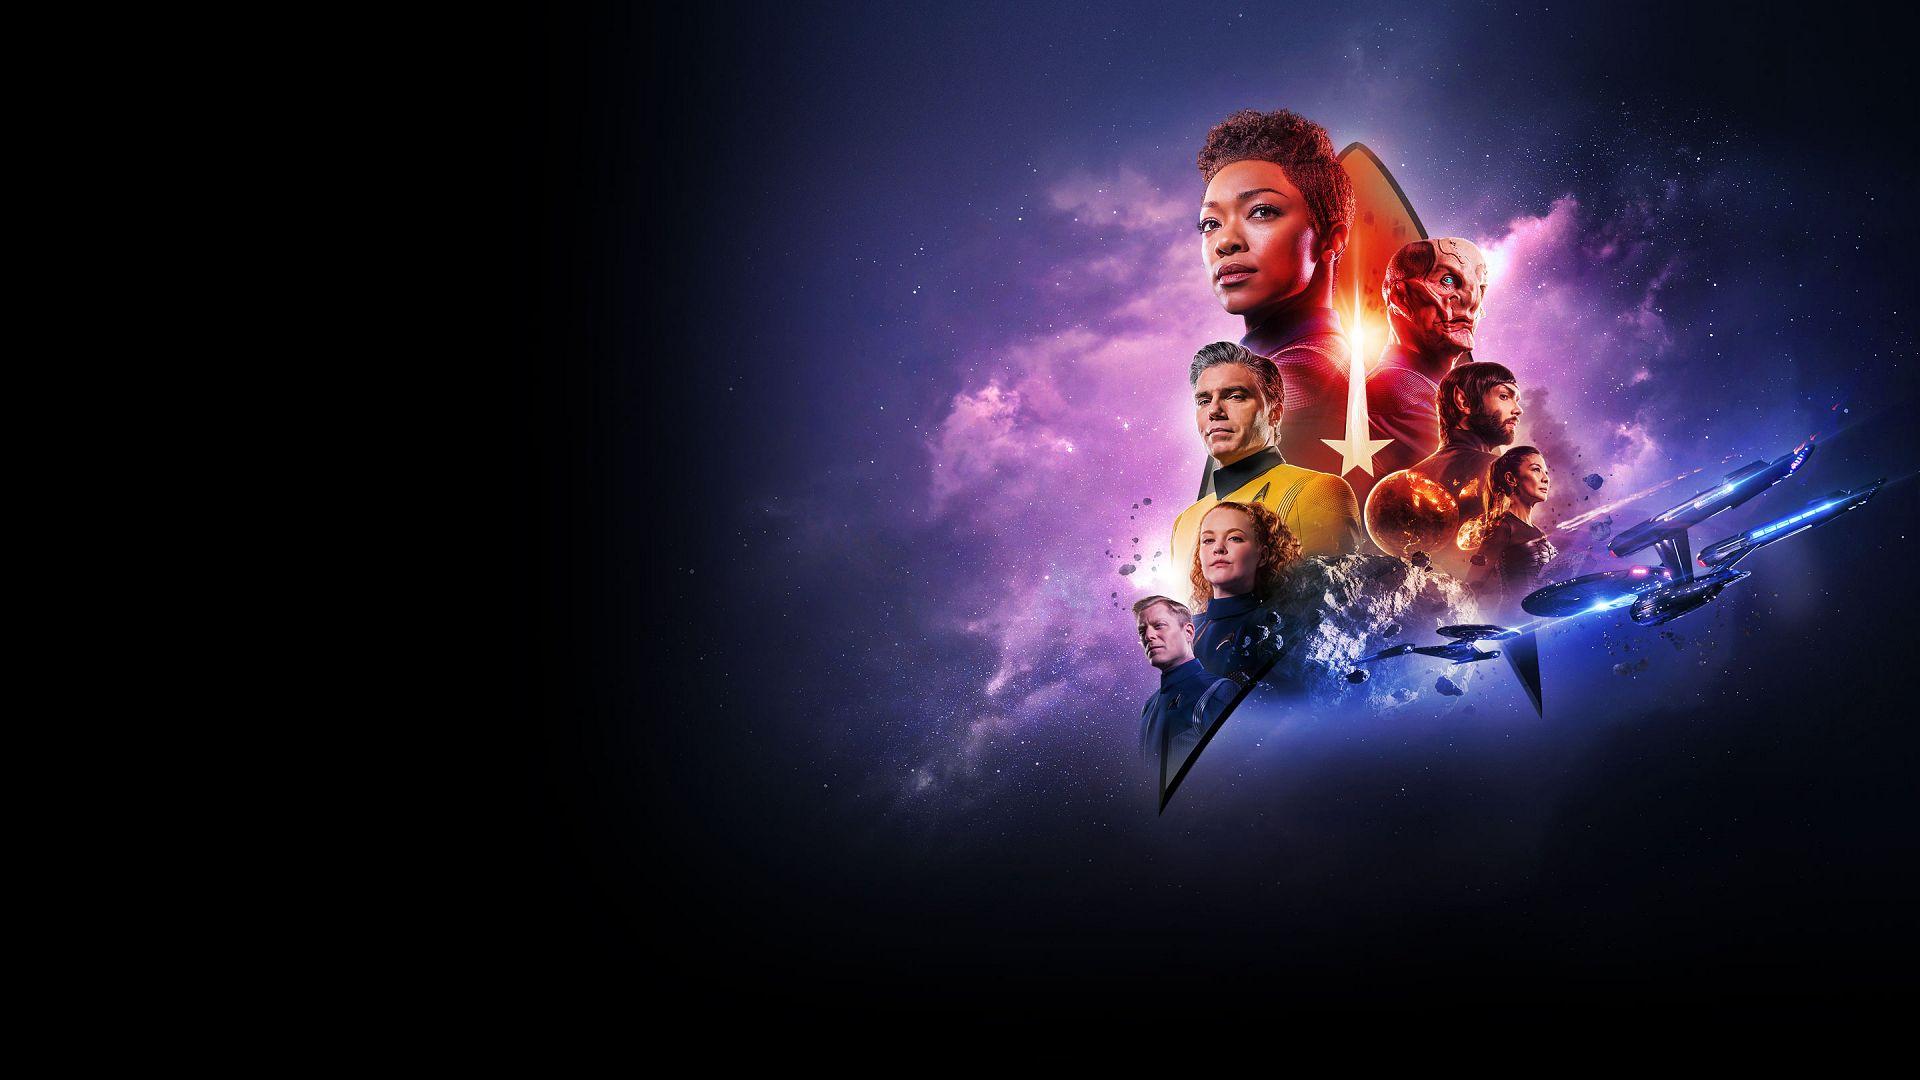 Star Trek - Discovery - Star Trek Discovery Season 2 , HD Wallpaper & Backgrounds